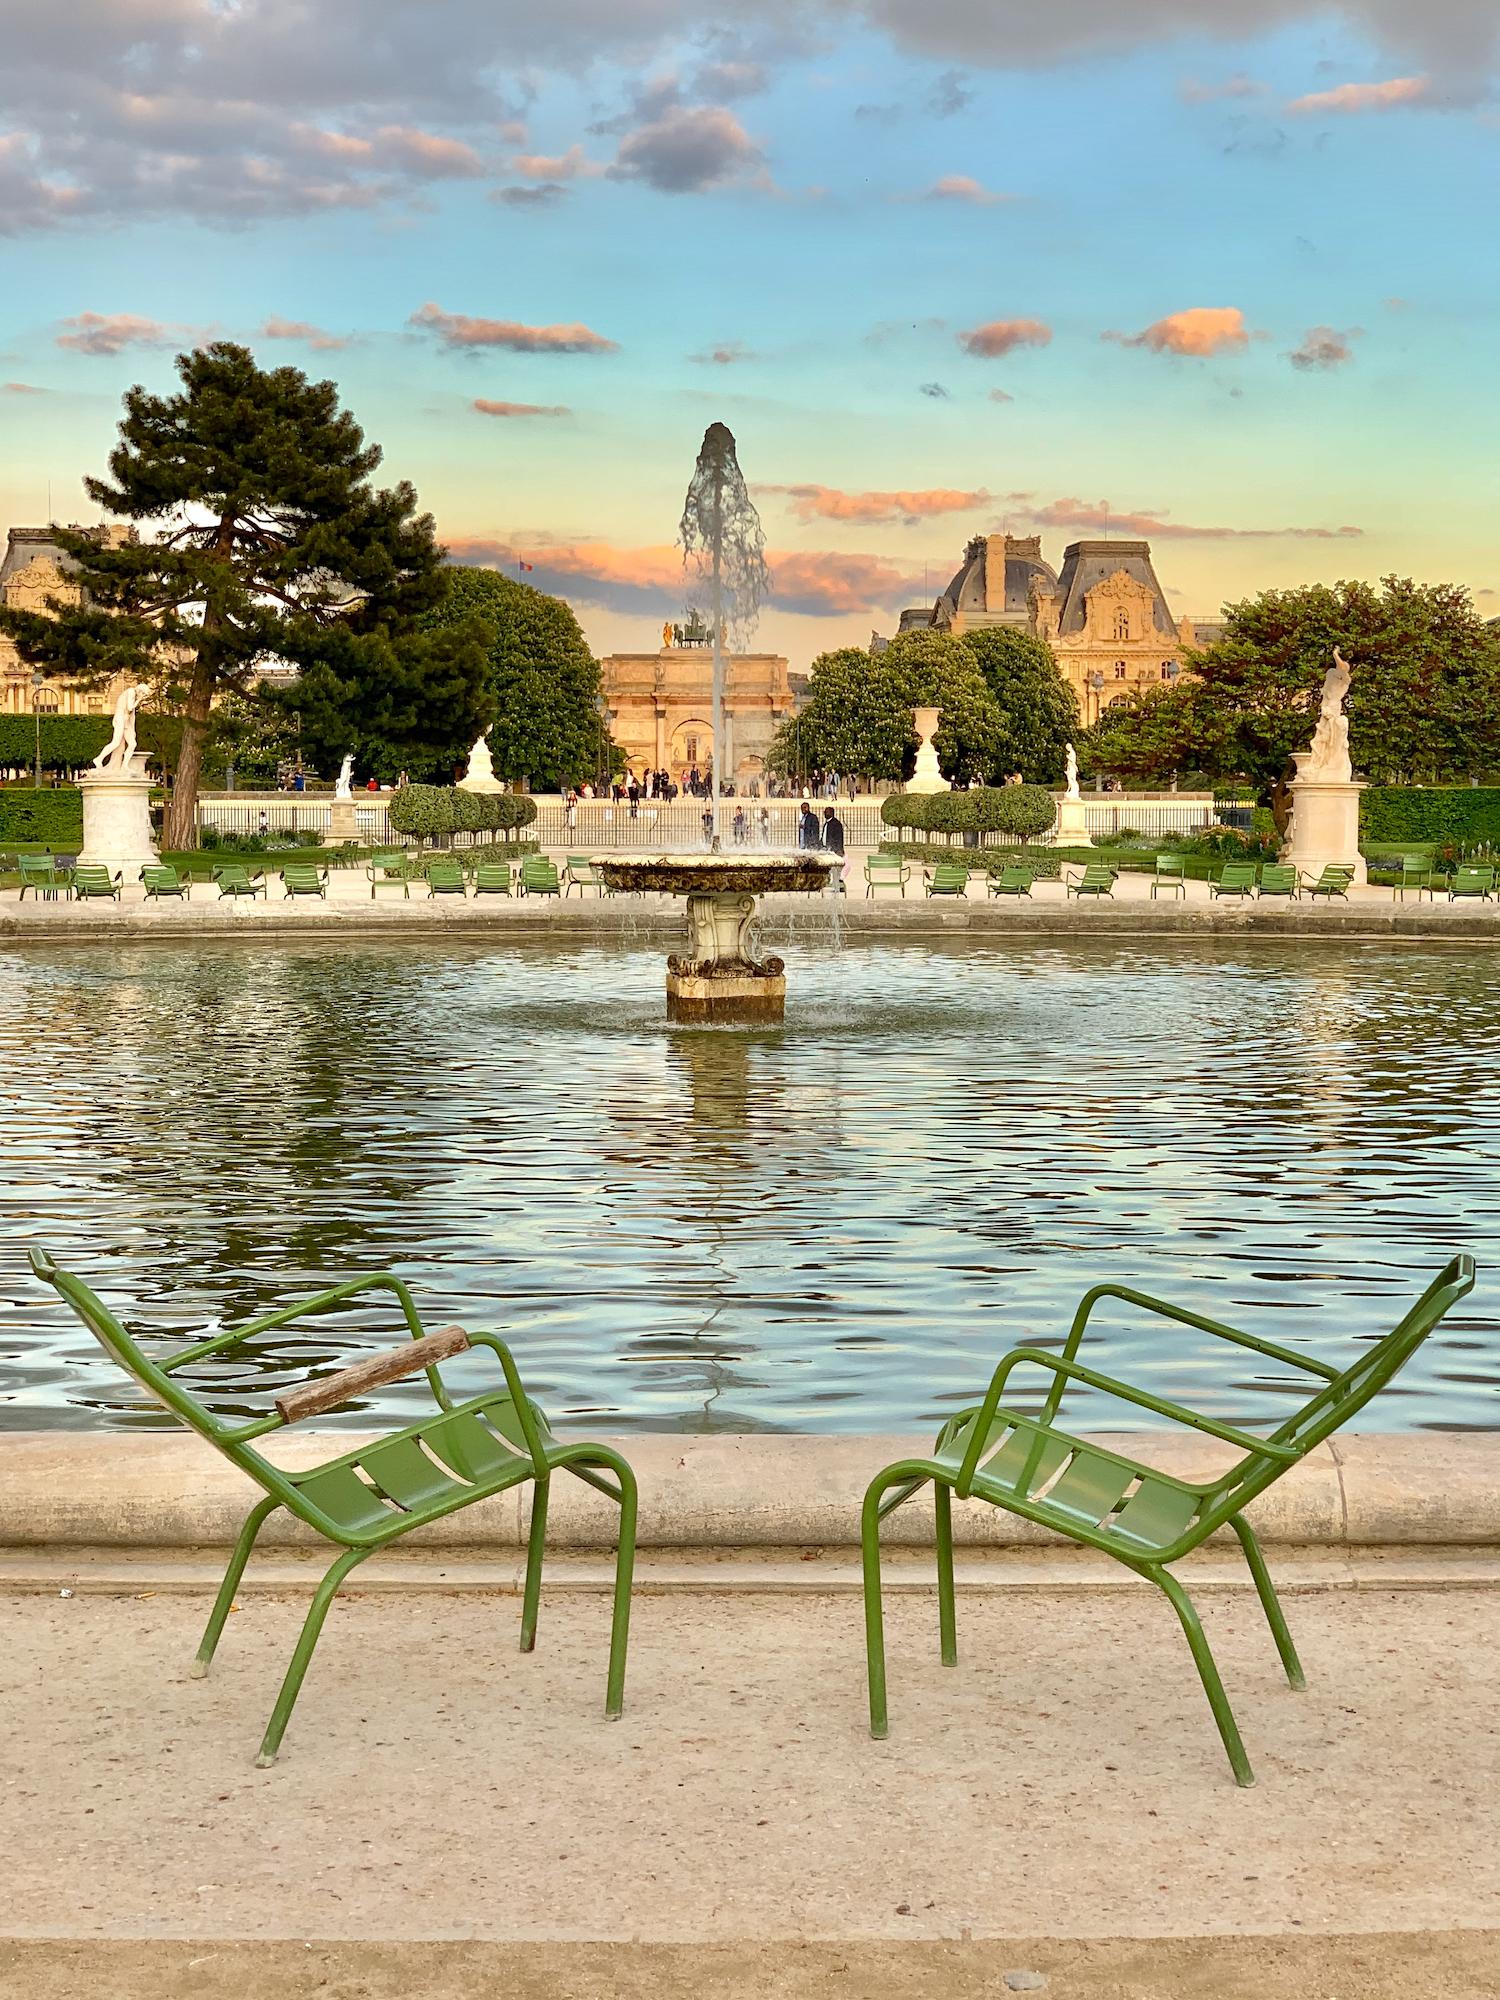 Tuileries Garden just before close